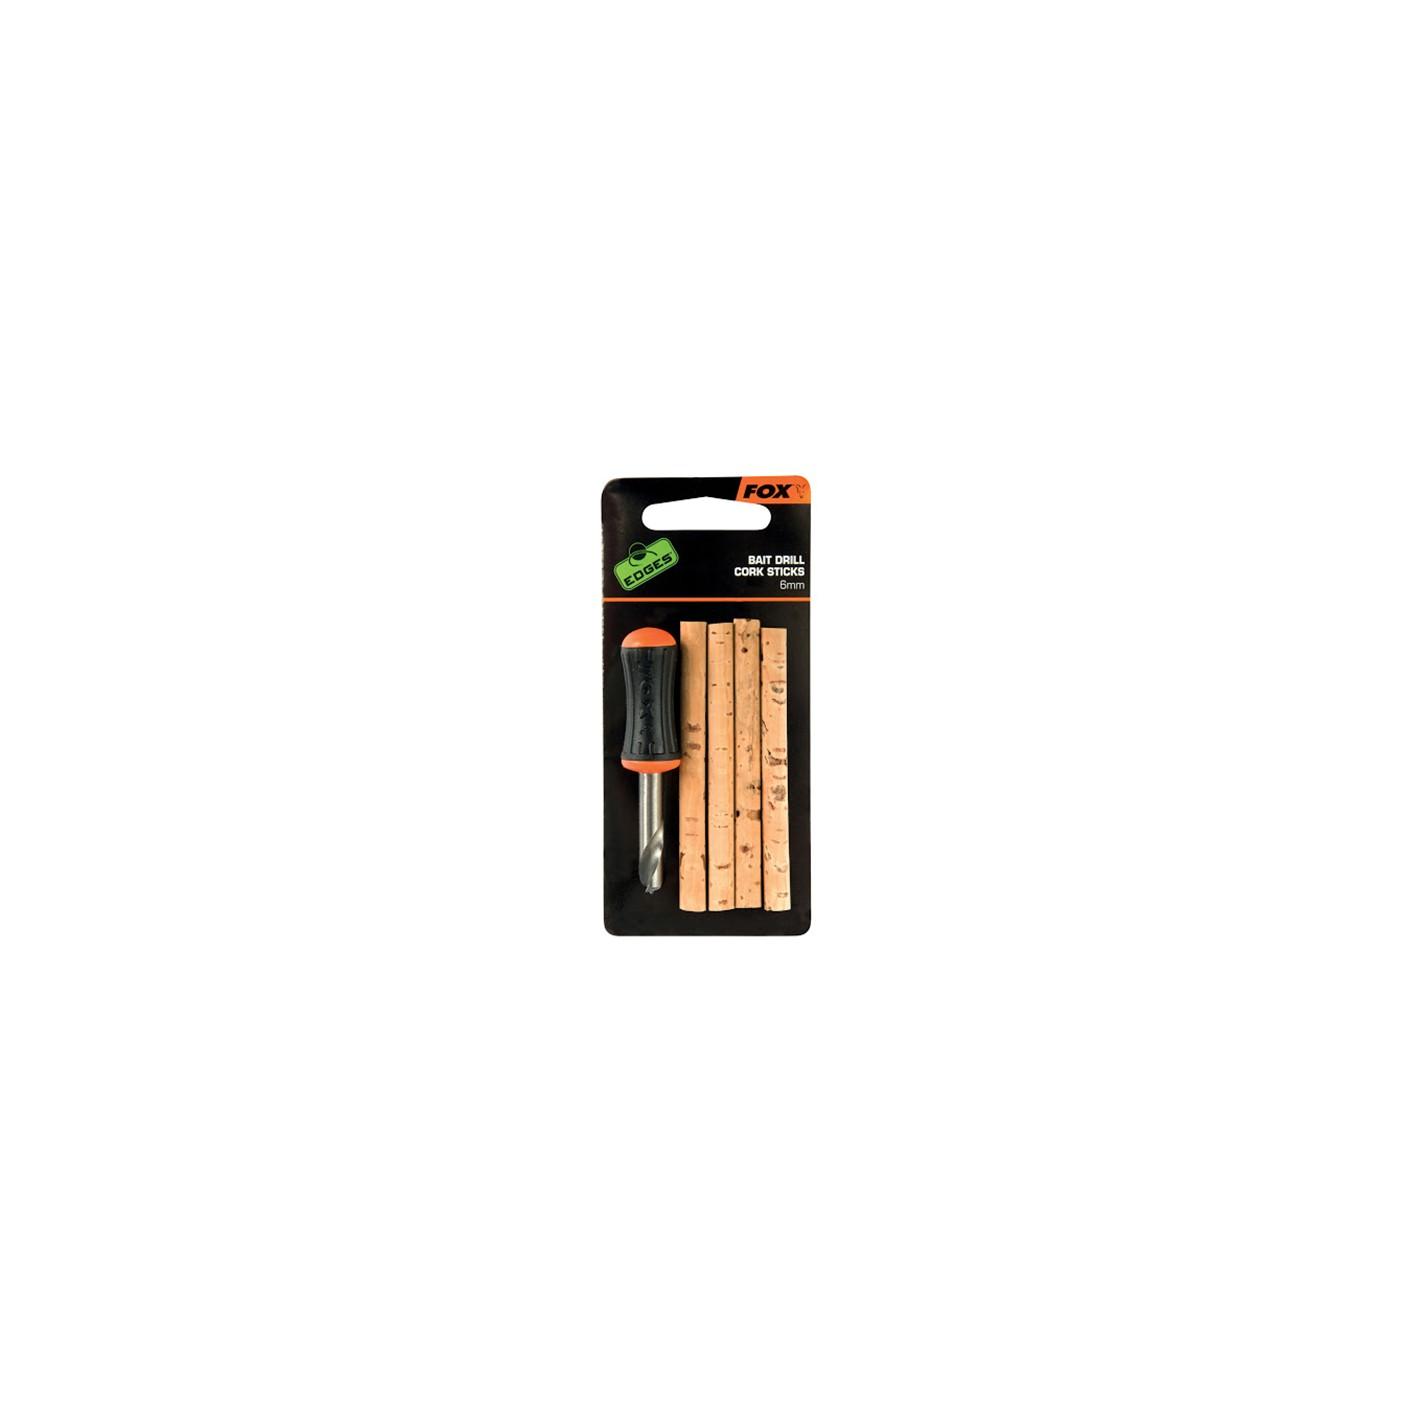 6mm Fox Edges Bait Drill /& Cork Sticks